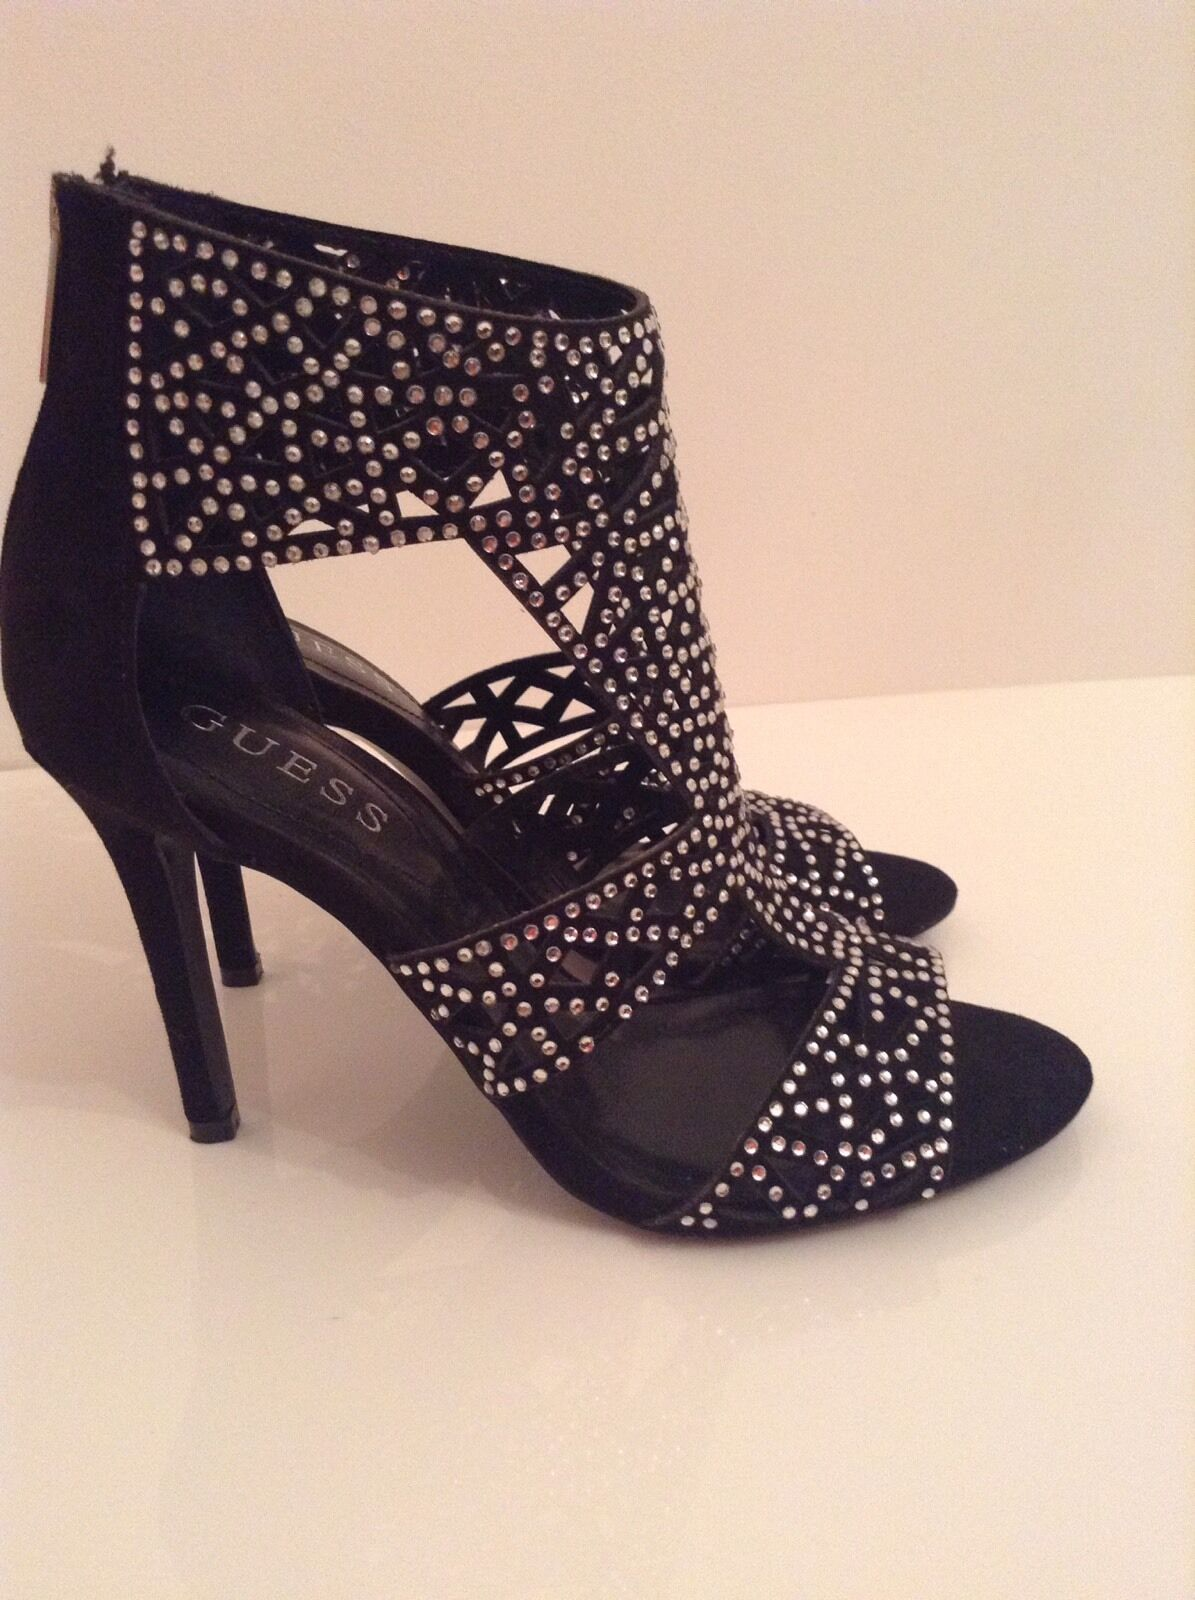 BNWTB 100% auth Guess, stiletto schwarz Laser Cut Diamante heels. 37